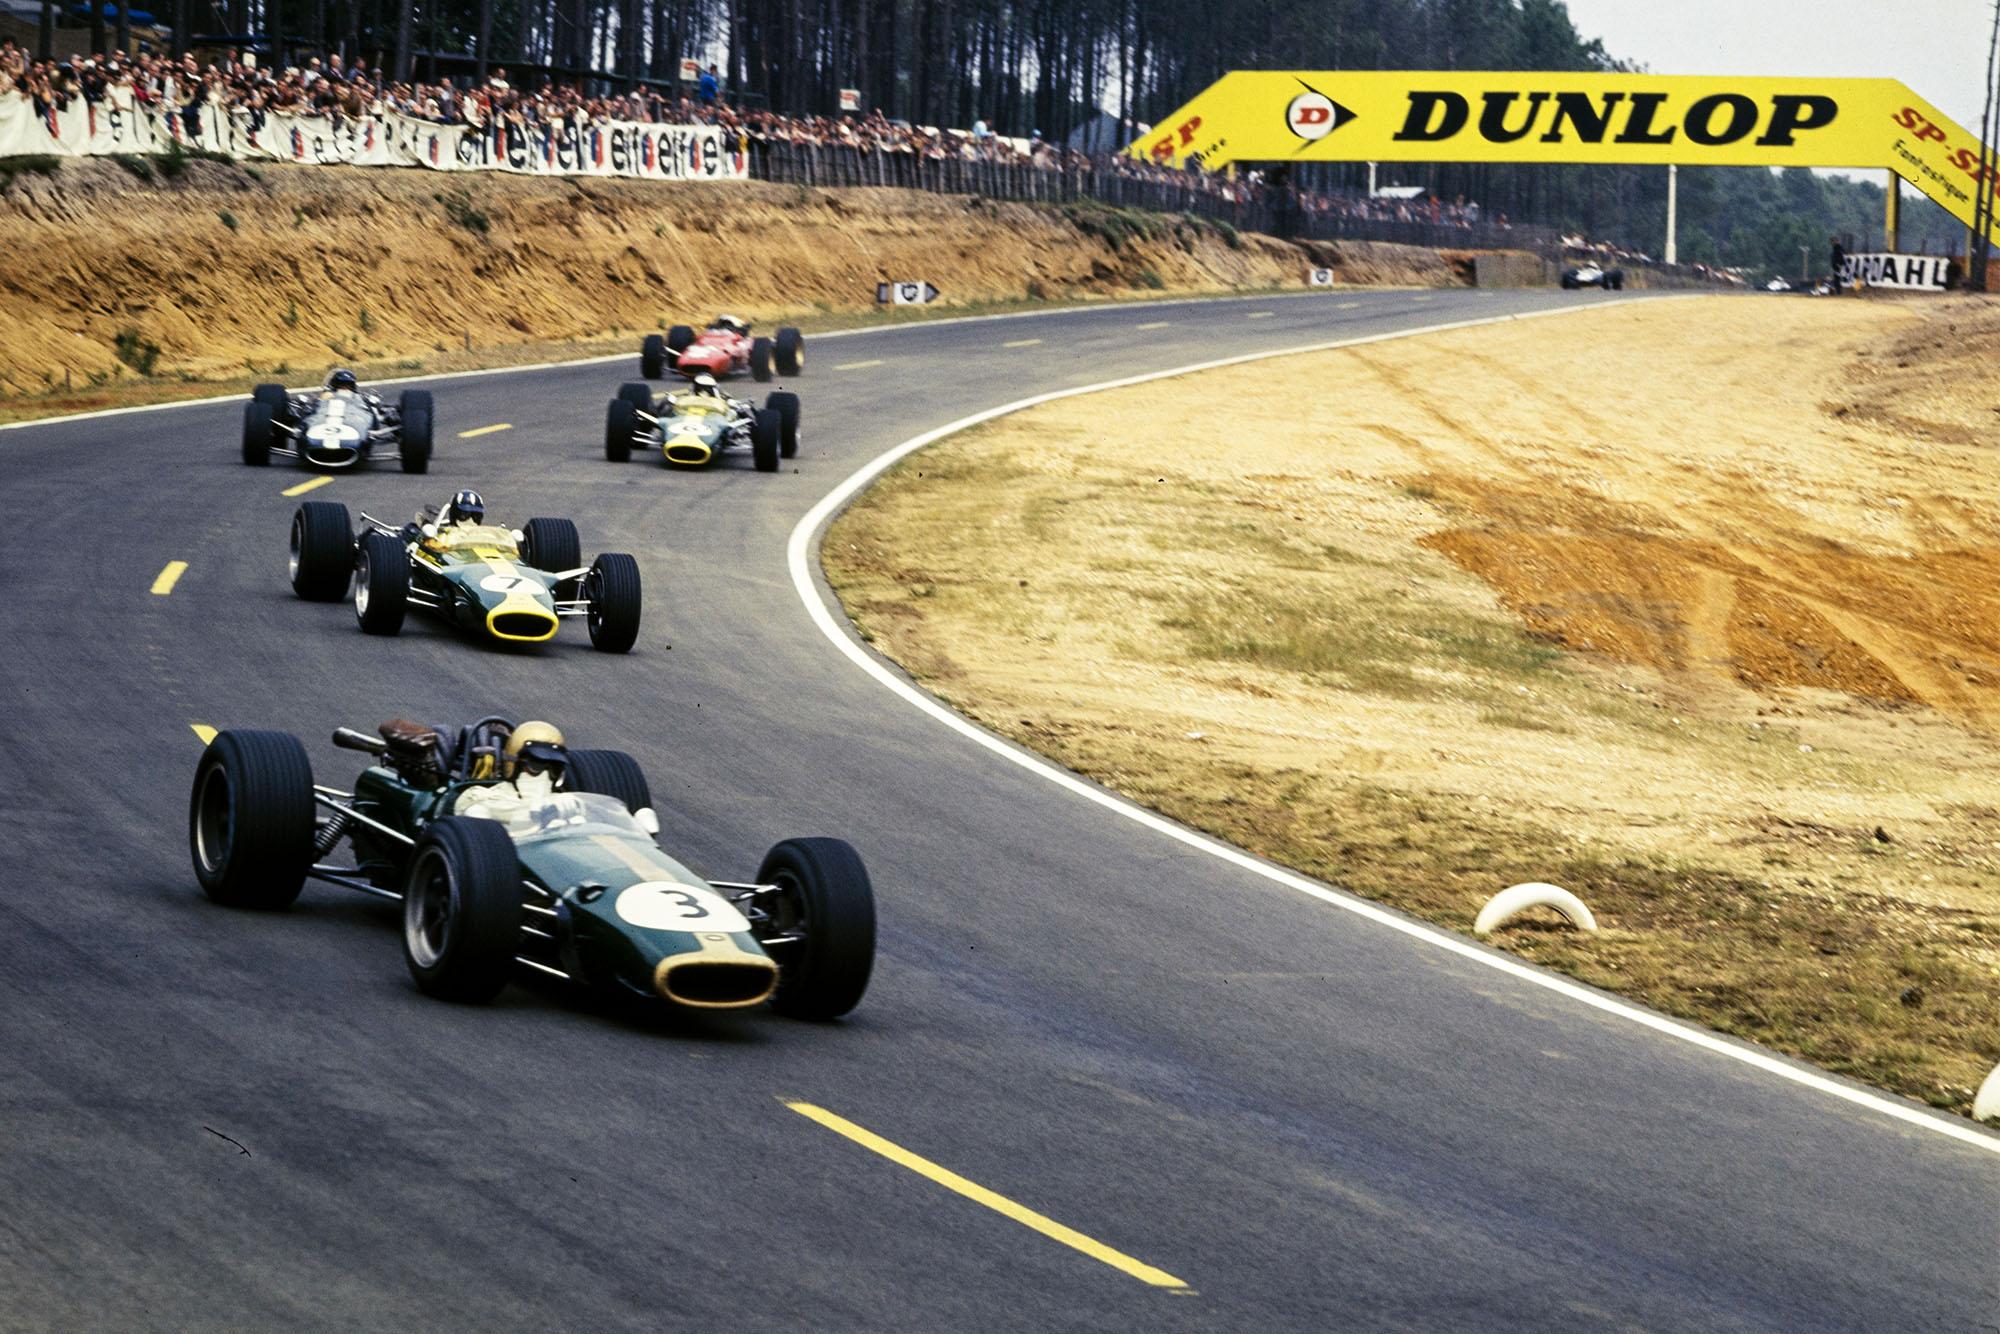 Jack Brabham, Brabham BT24 Repco, leads Graham Hill, Lotus 49 Ford, Dan Gurney, Eagle T1G Weslake.